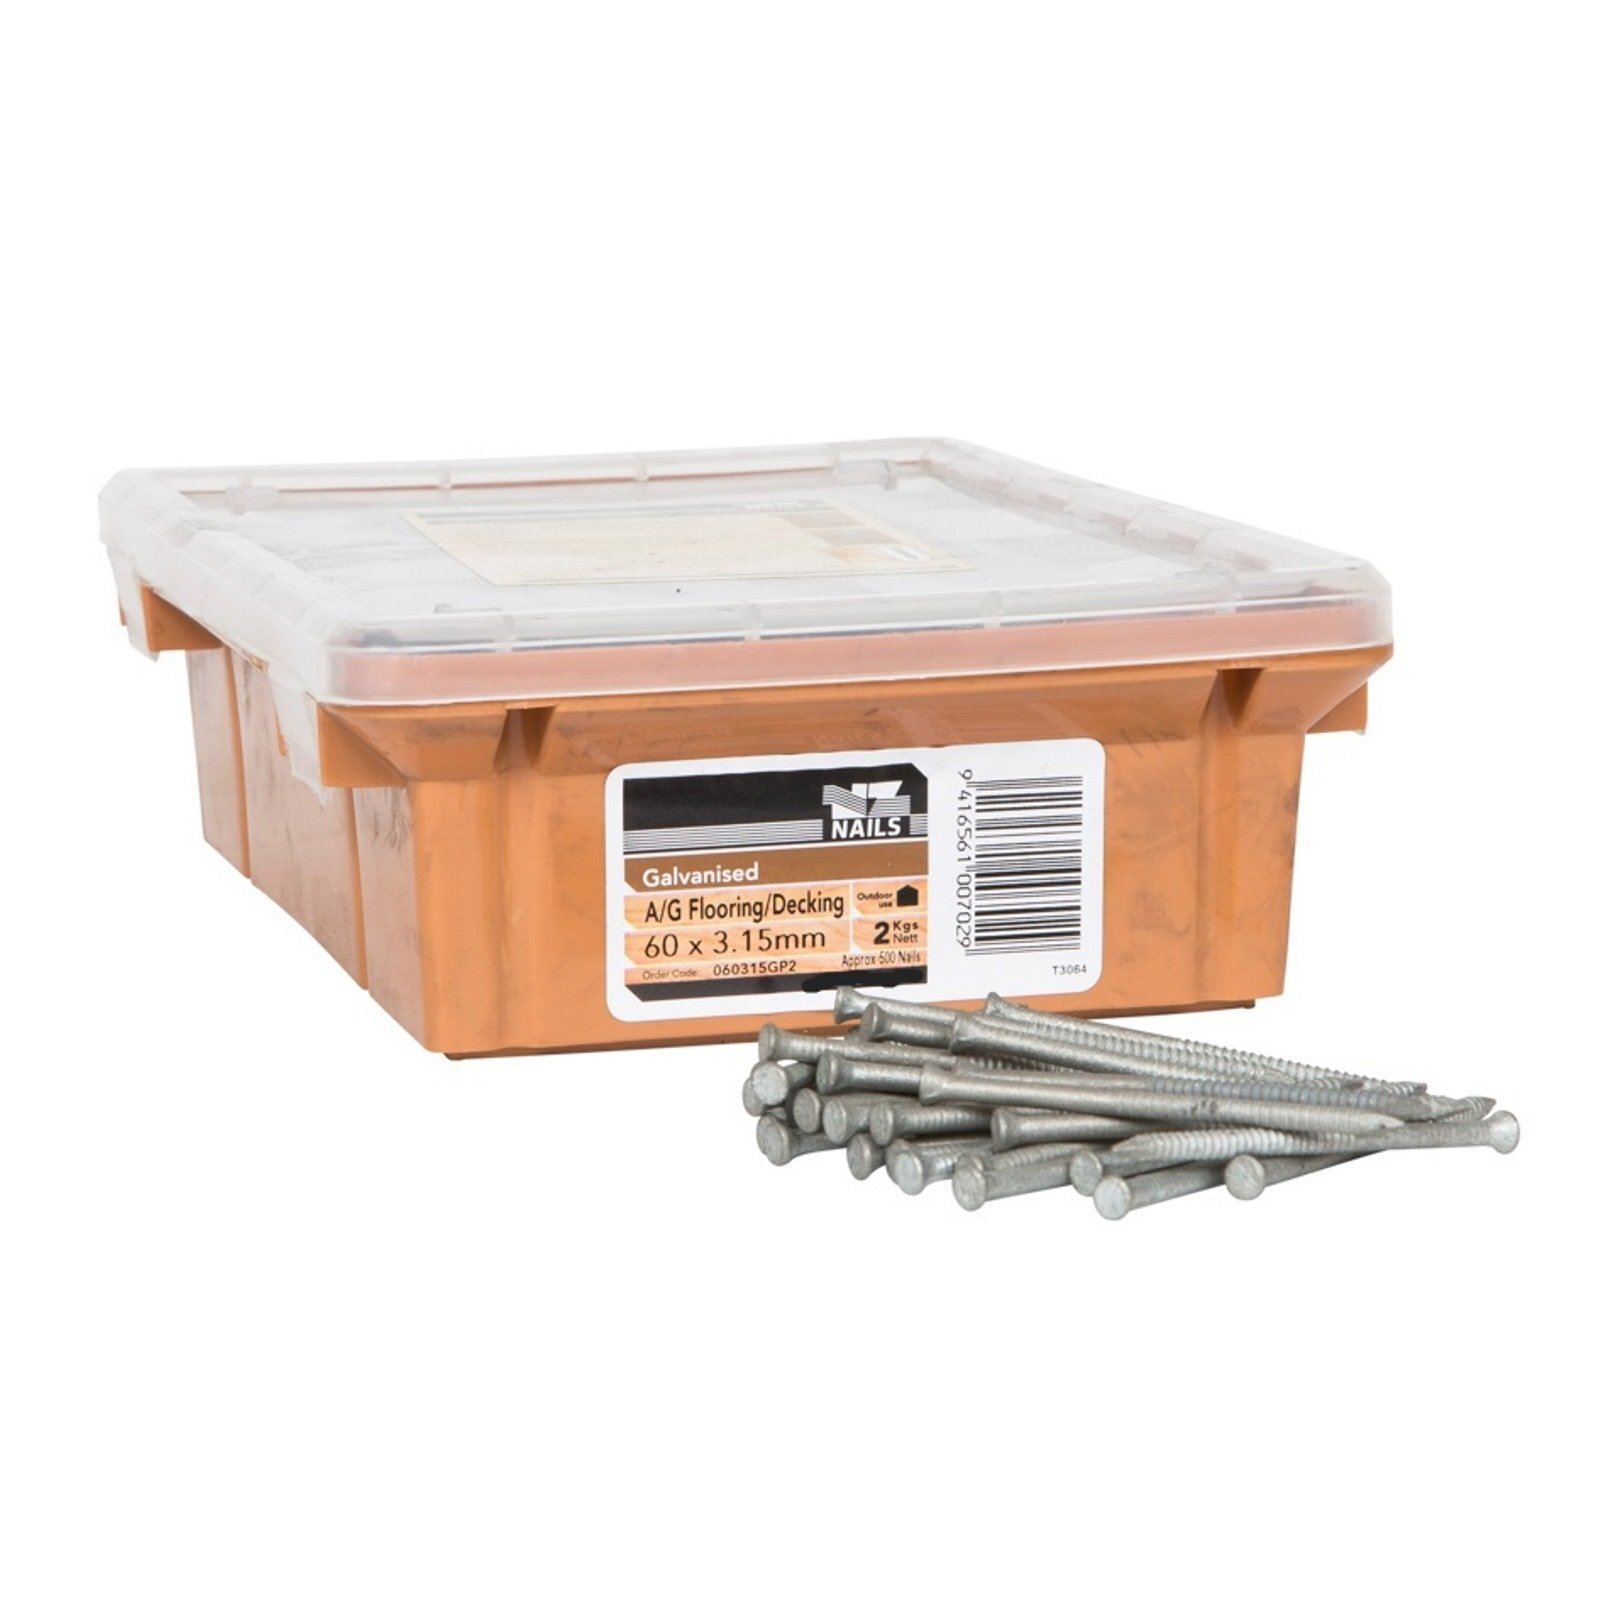 NZ Nails 60 x 3.15mm Galvanised Timber Flooring Nail - 2kg Box